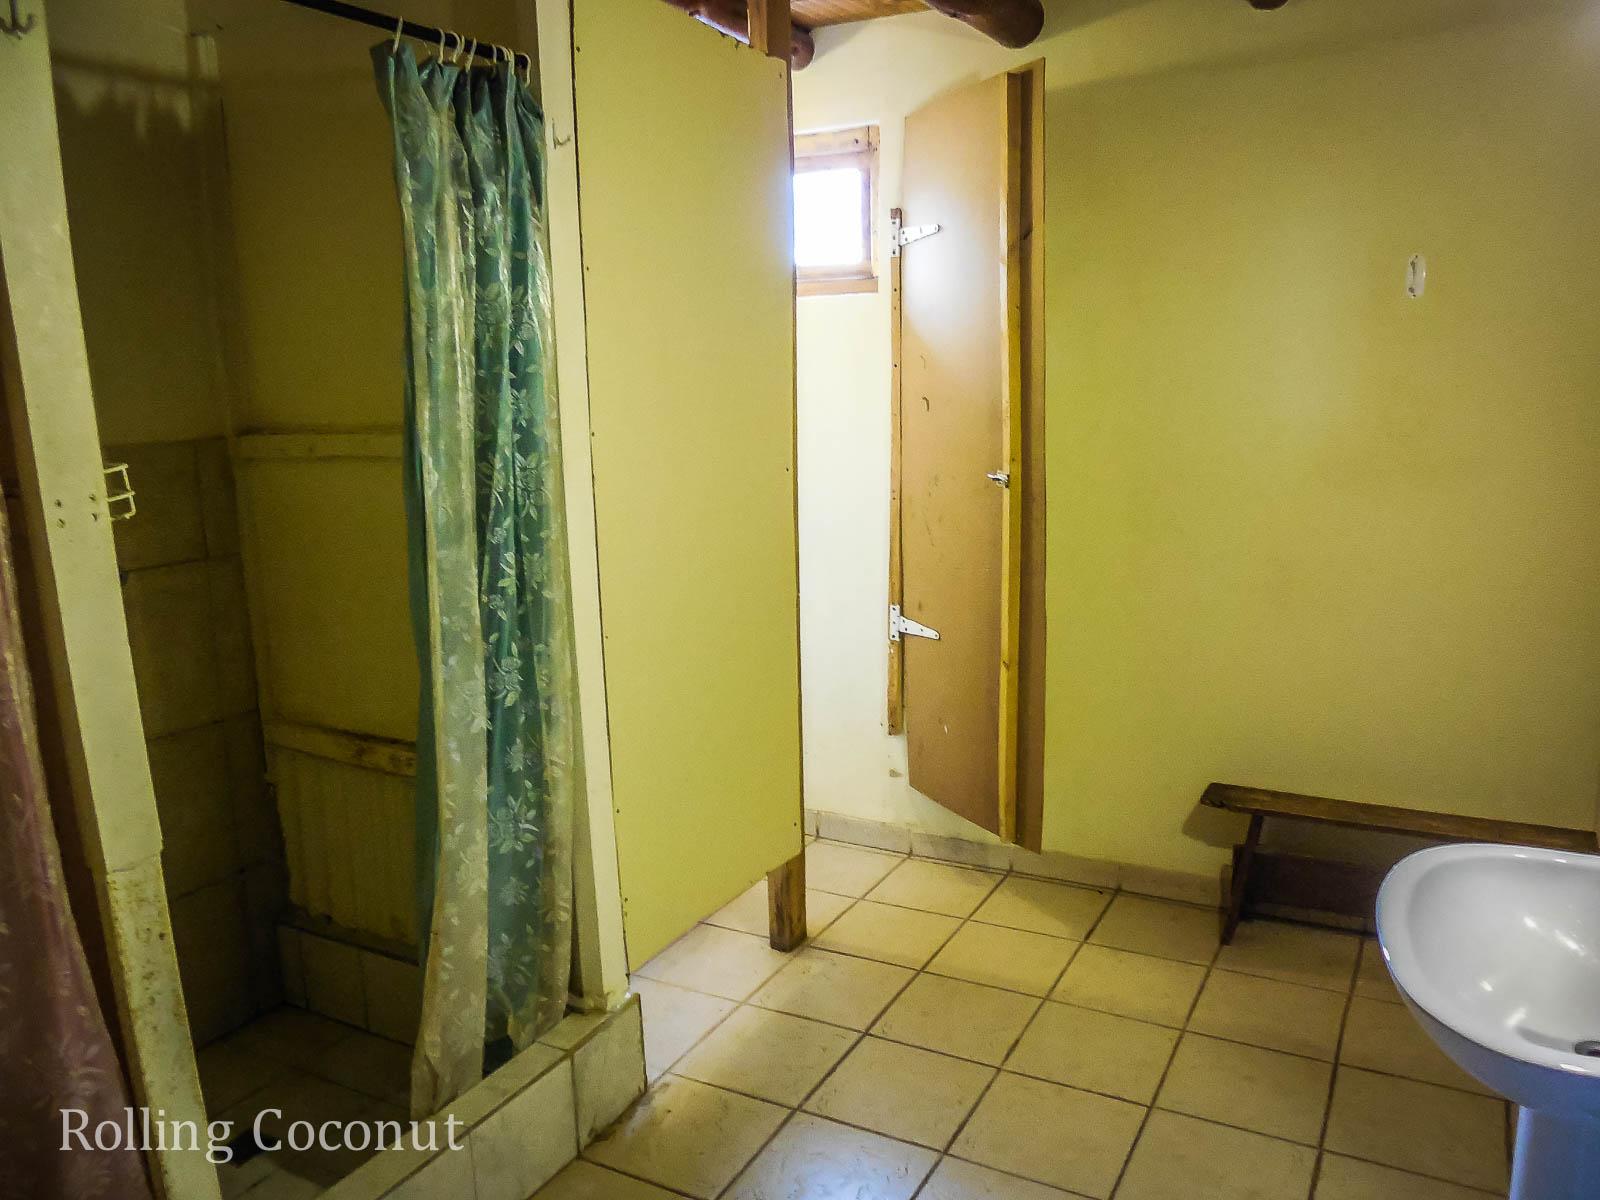 El Chalten Argentina Patagonia Refugio Chalten Bathroom ooaworld Rolling Coconut Photo Ooaworld